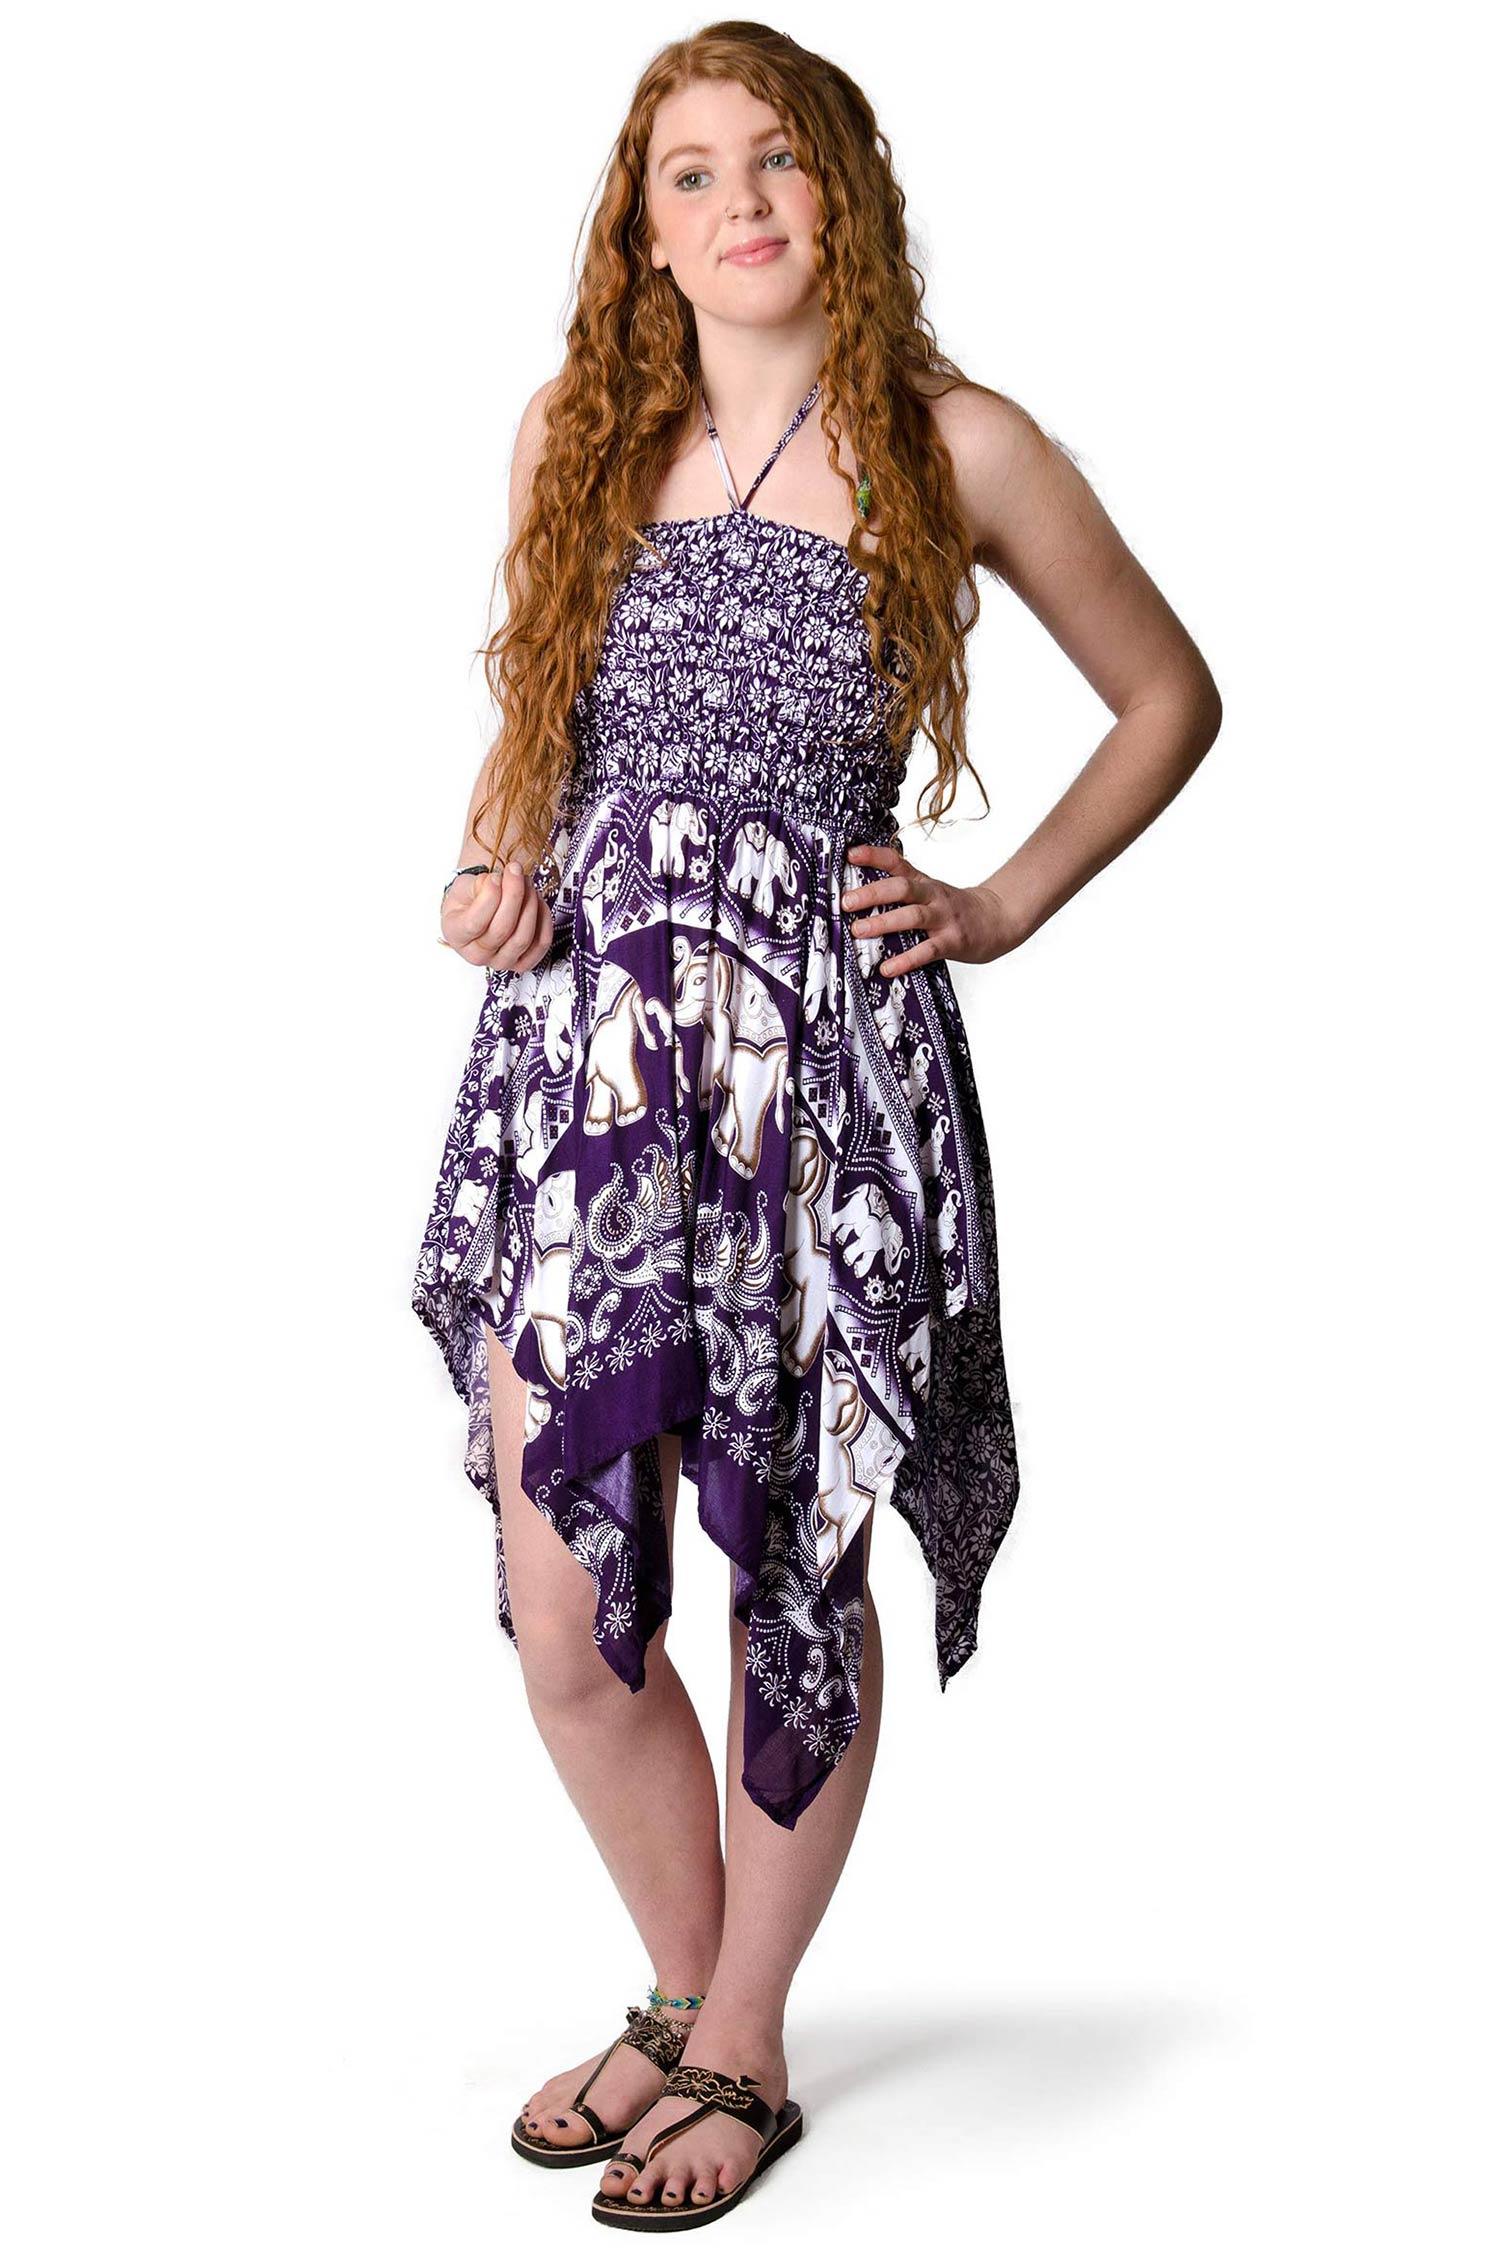 507363474b0 Elephant Print Convertible Fairy Dress - Skirt - Purple